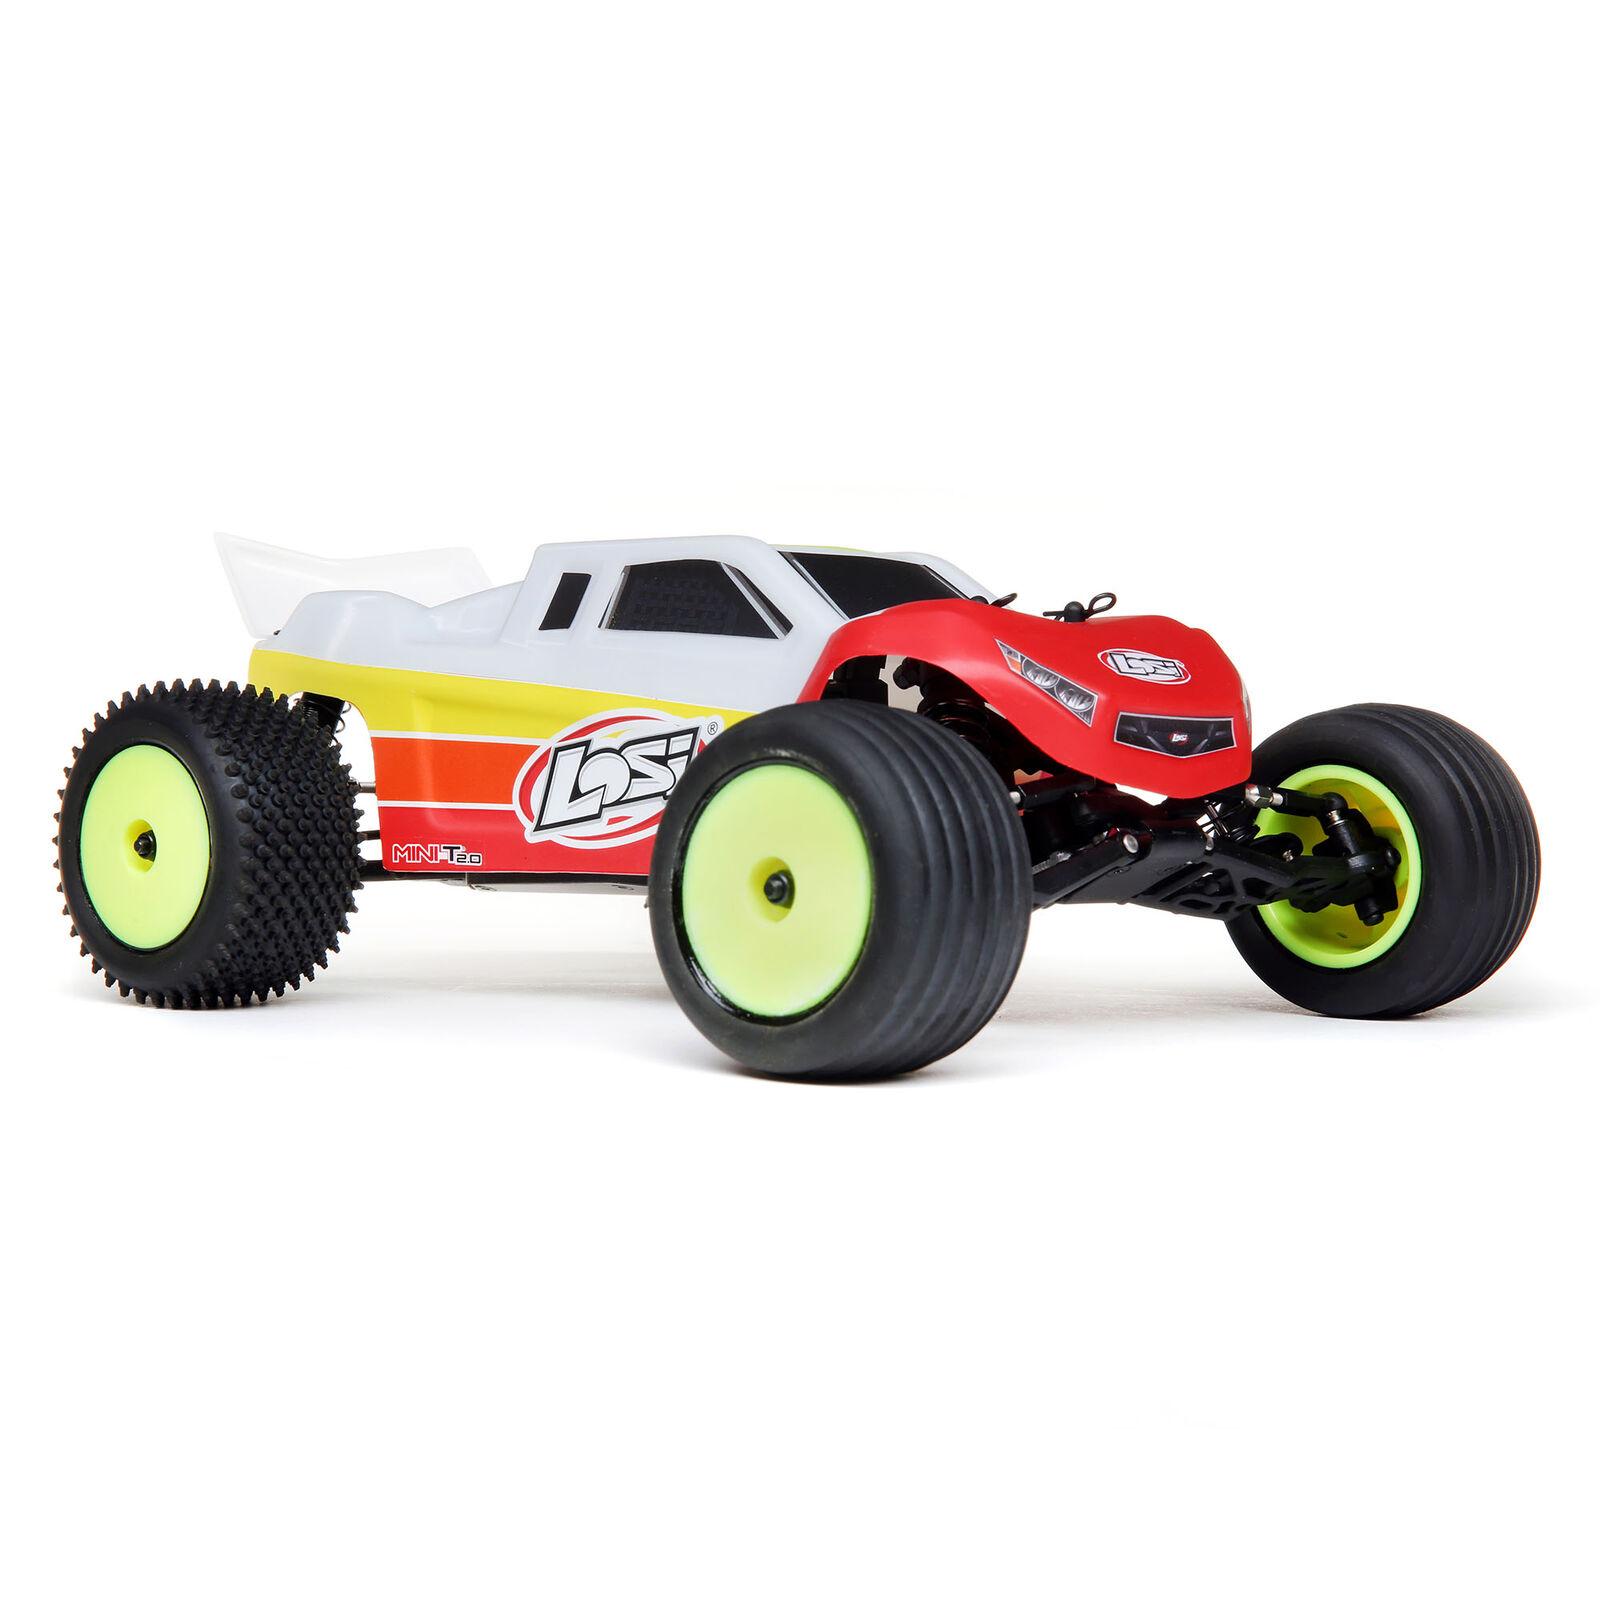 1/18 Mini-T 2.0 2WD Stadium Truck Brushless RTR, Red